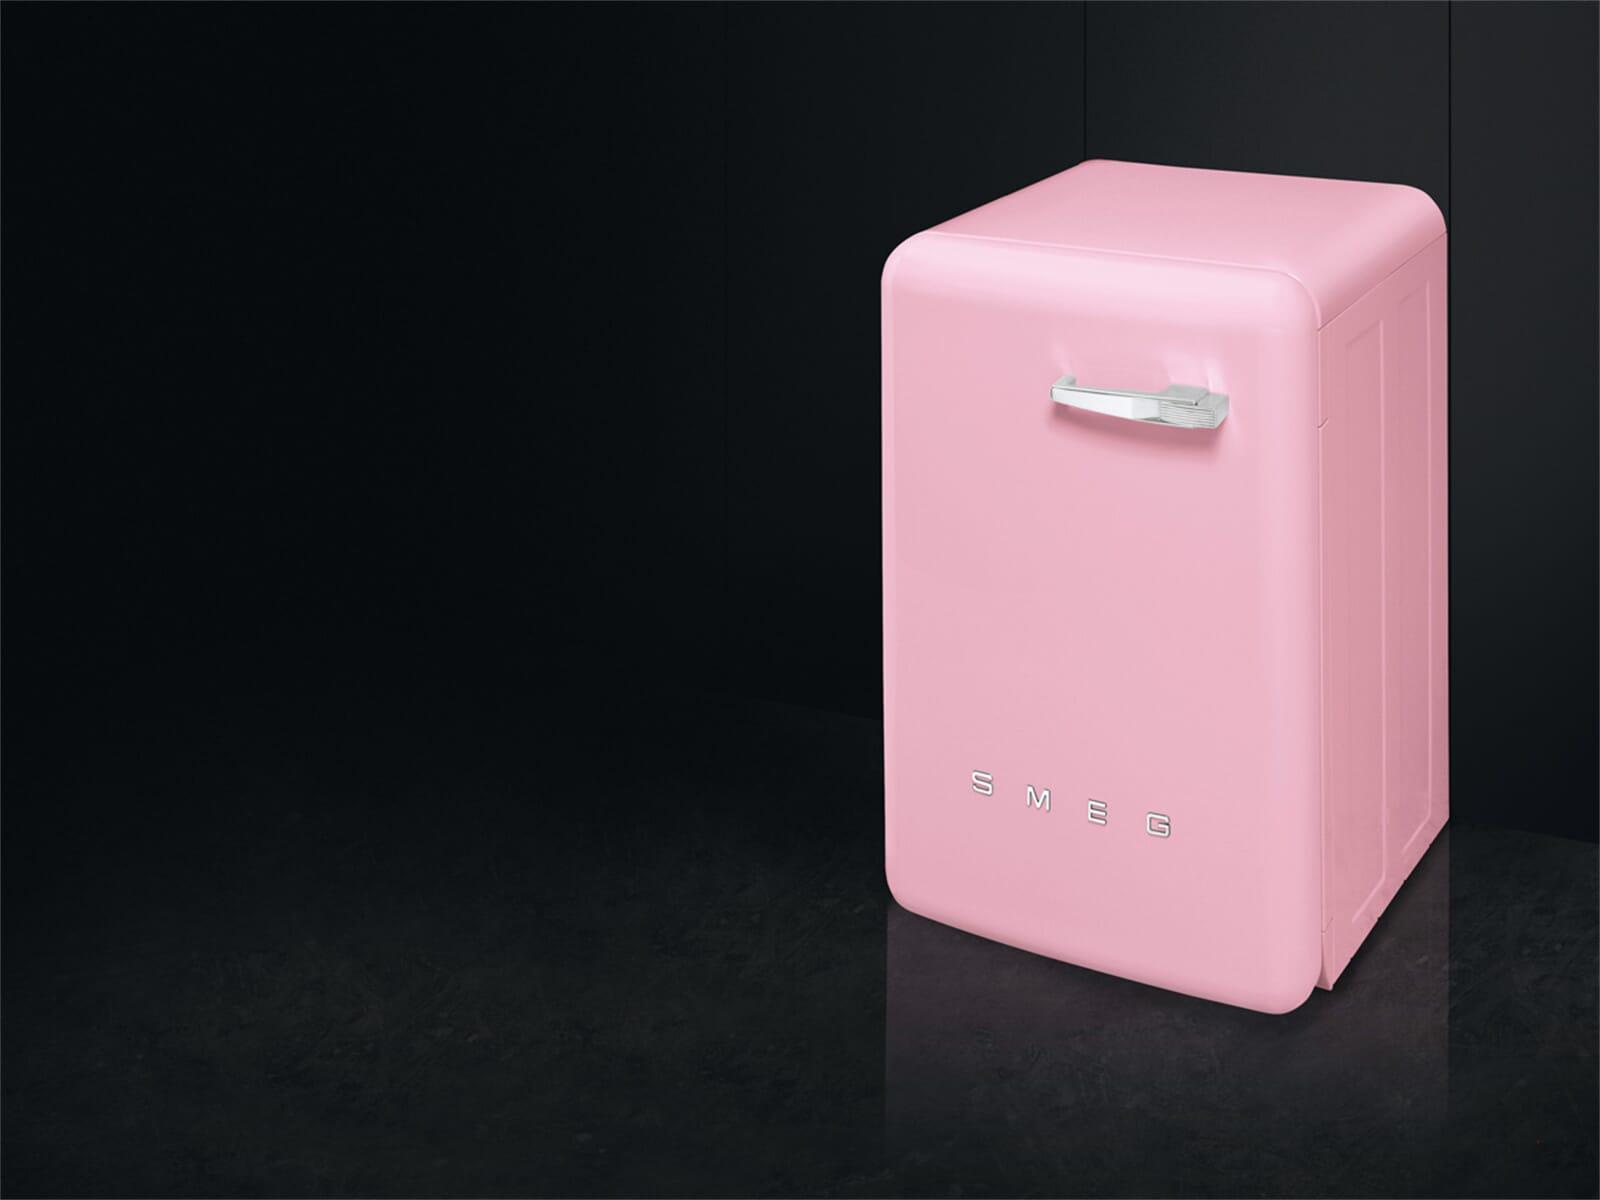 smeg lbb14pk 2 waschmaschine cadillac pink. Black Bedroom Furniture Sets. Home Design Ideas